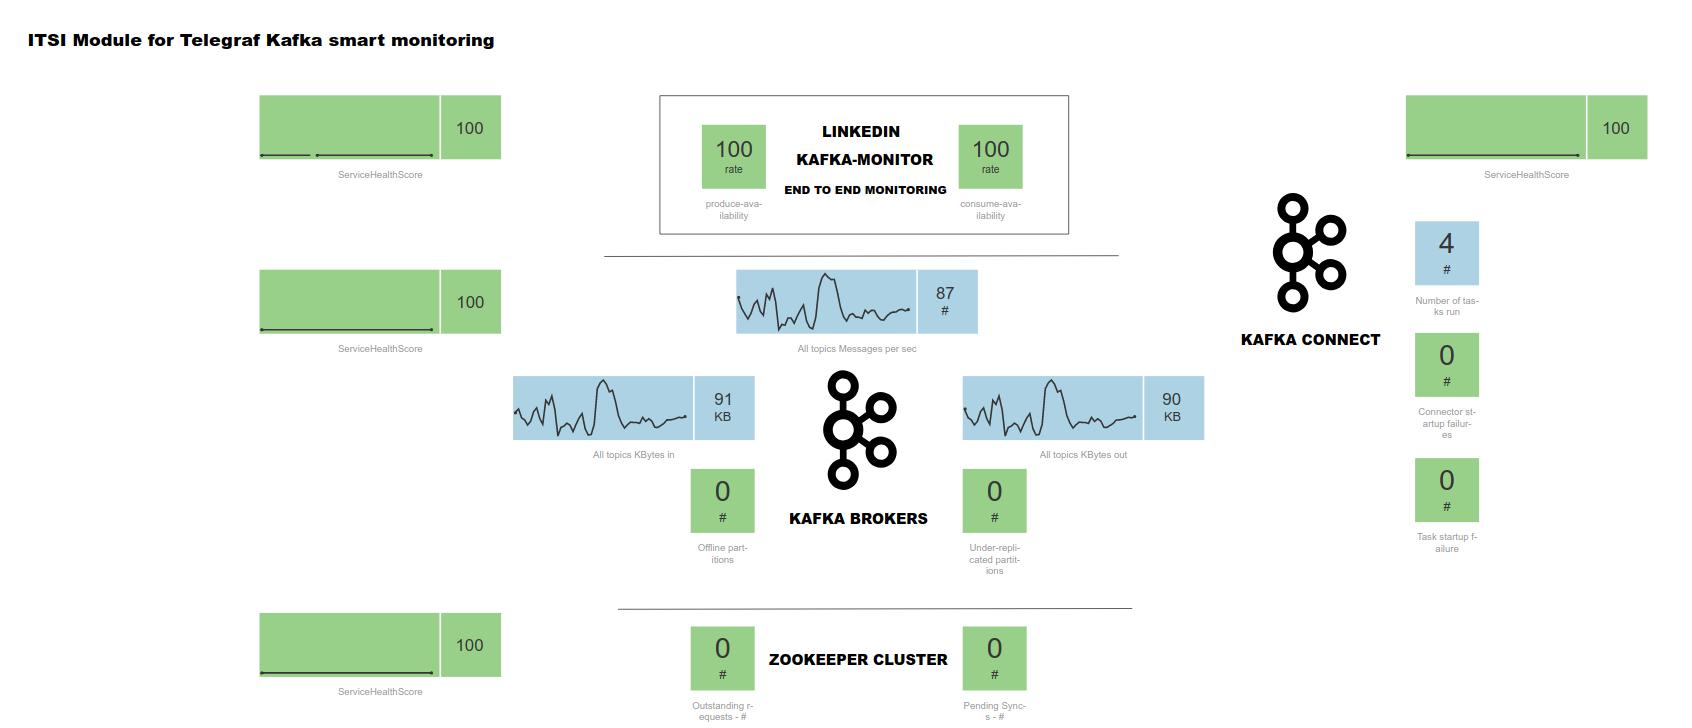 Welcome to the ITSI module for Telegraf Apache Kafka smart